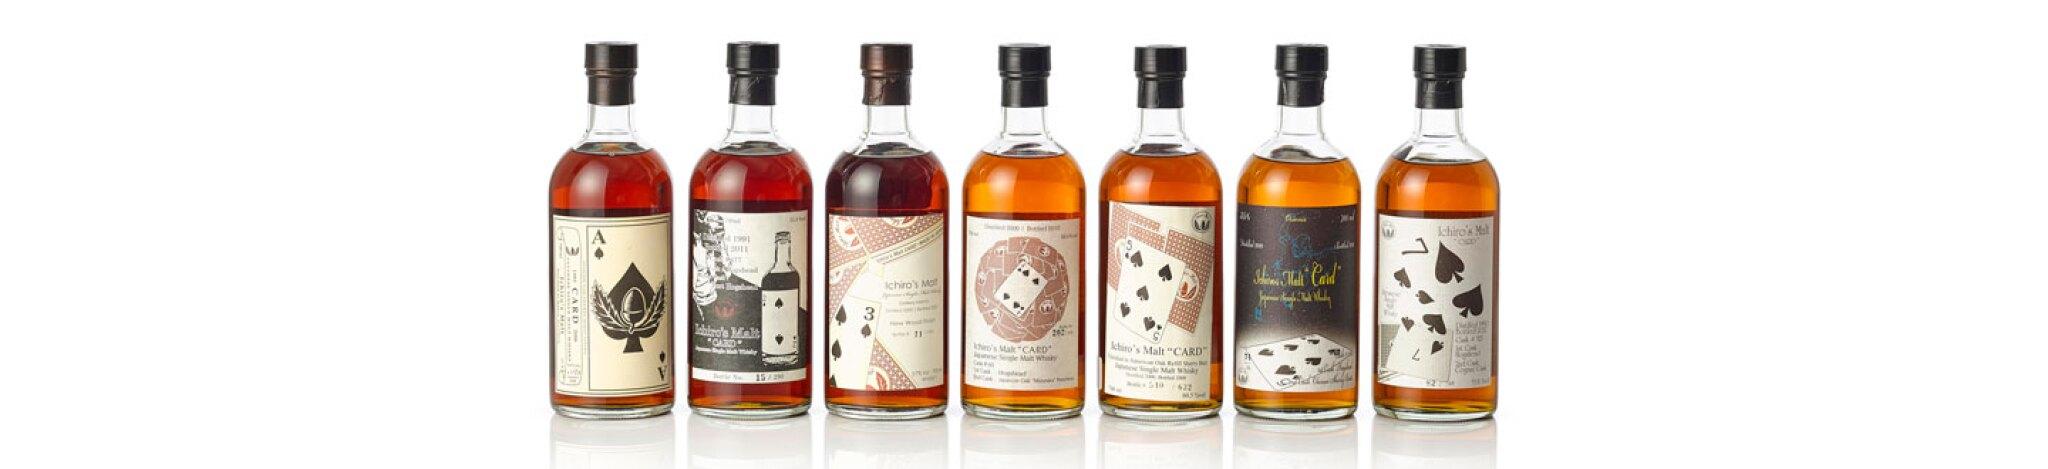 Distilled | A Single Collection Featuring Rare Macallan, Suntory & Karuizawa Single Cask Whisky